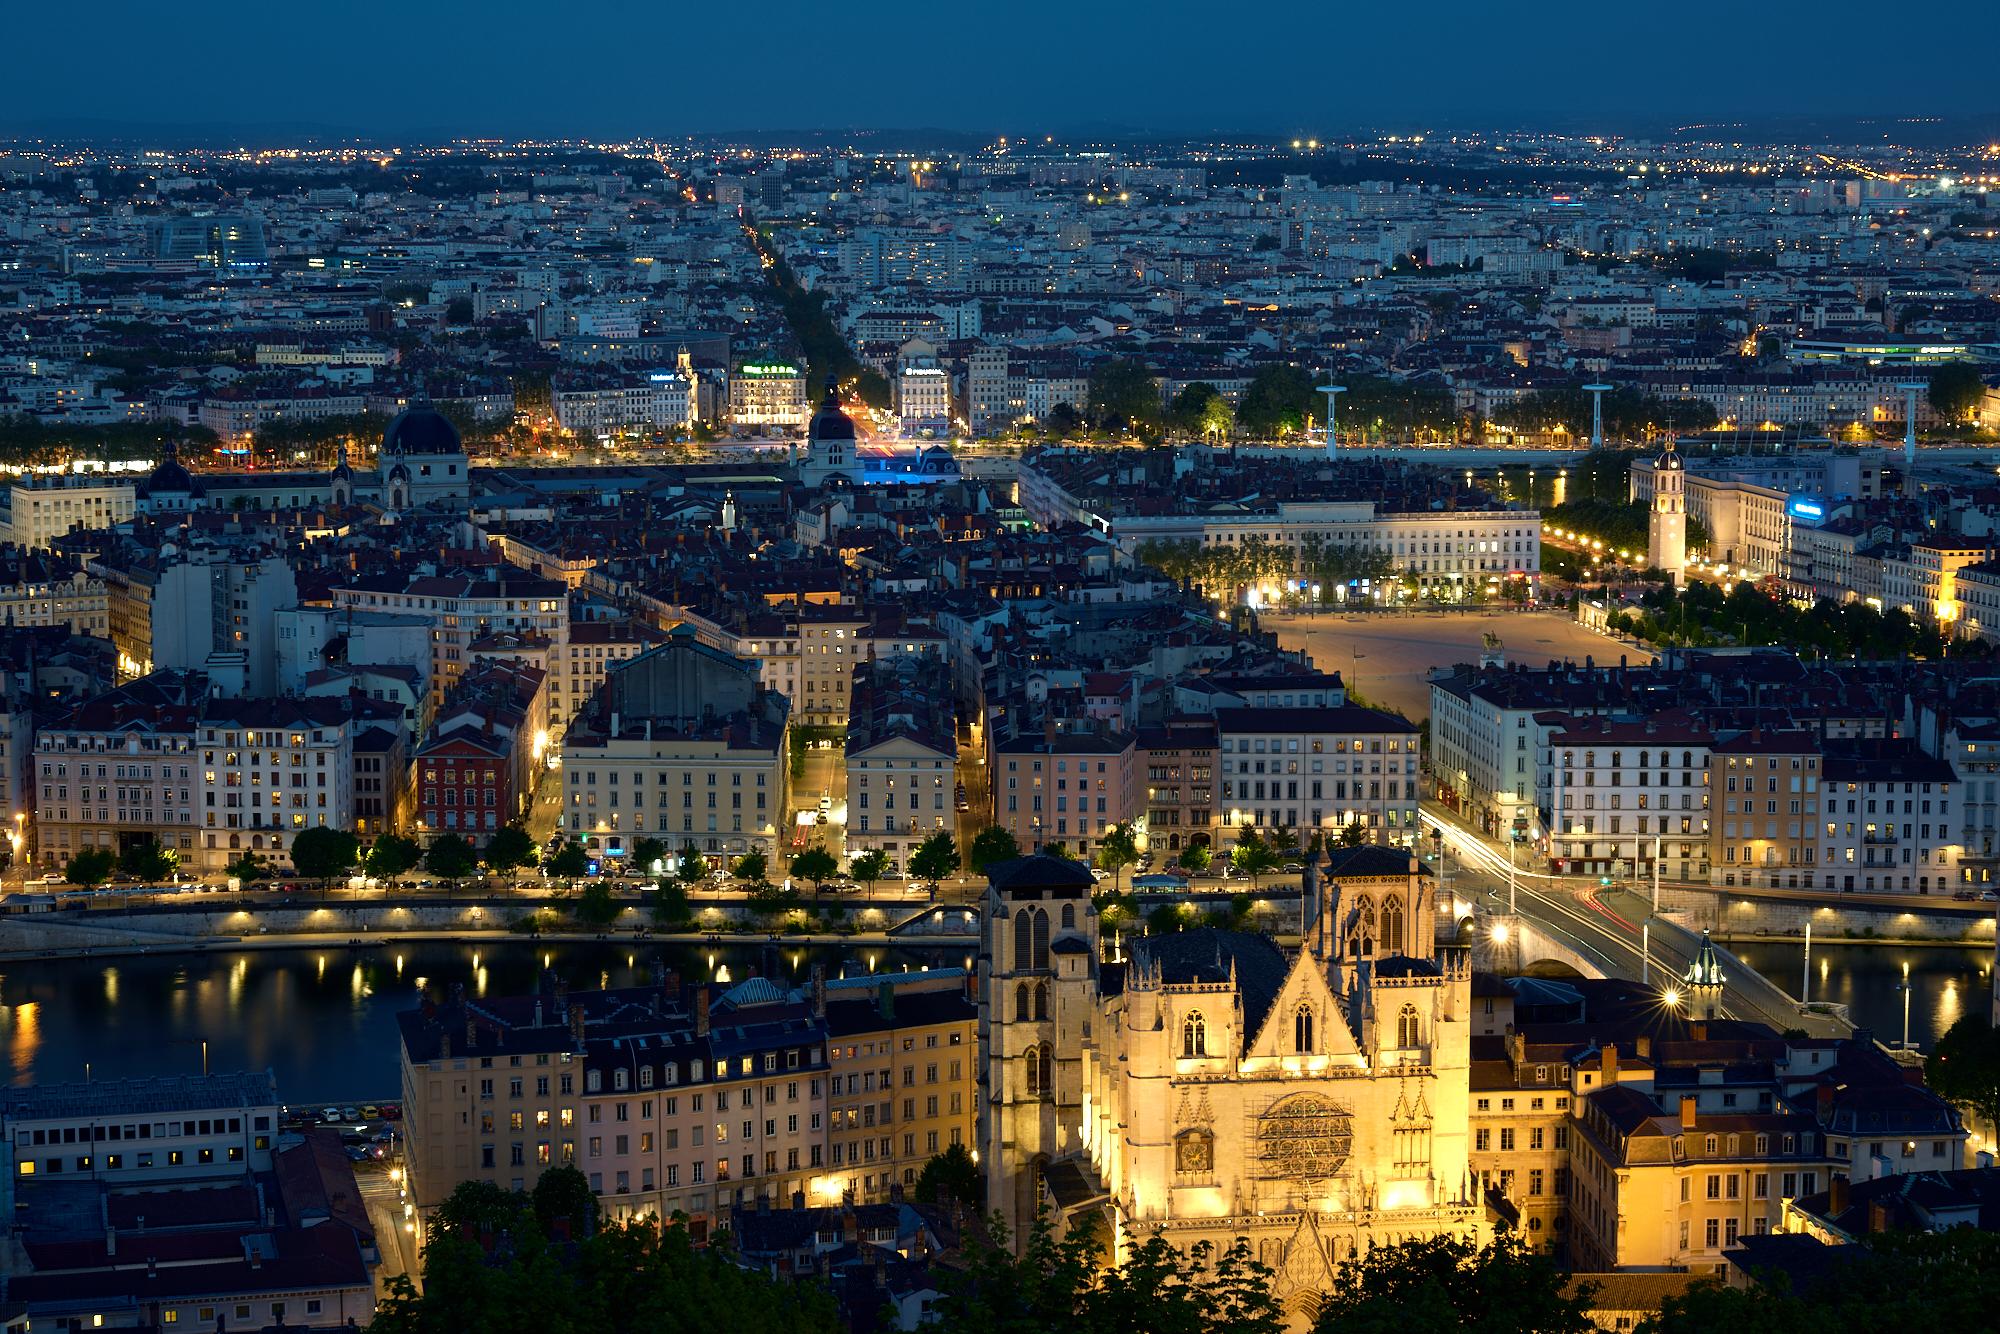 Lyon,_France_(41786112471)